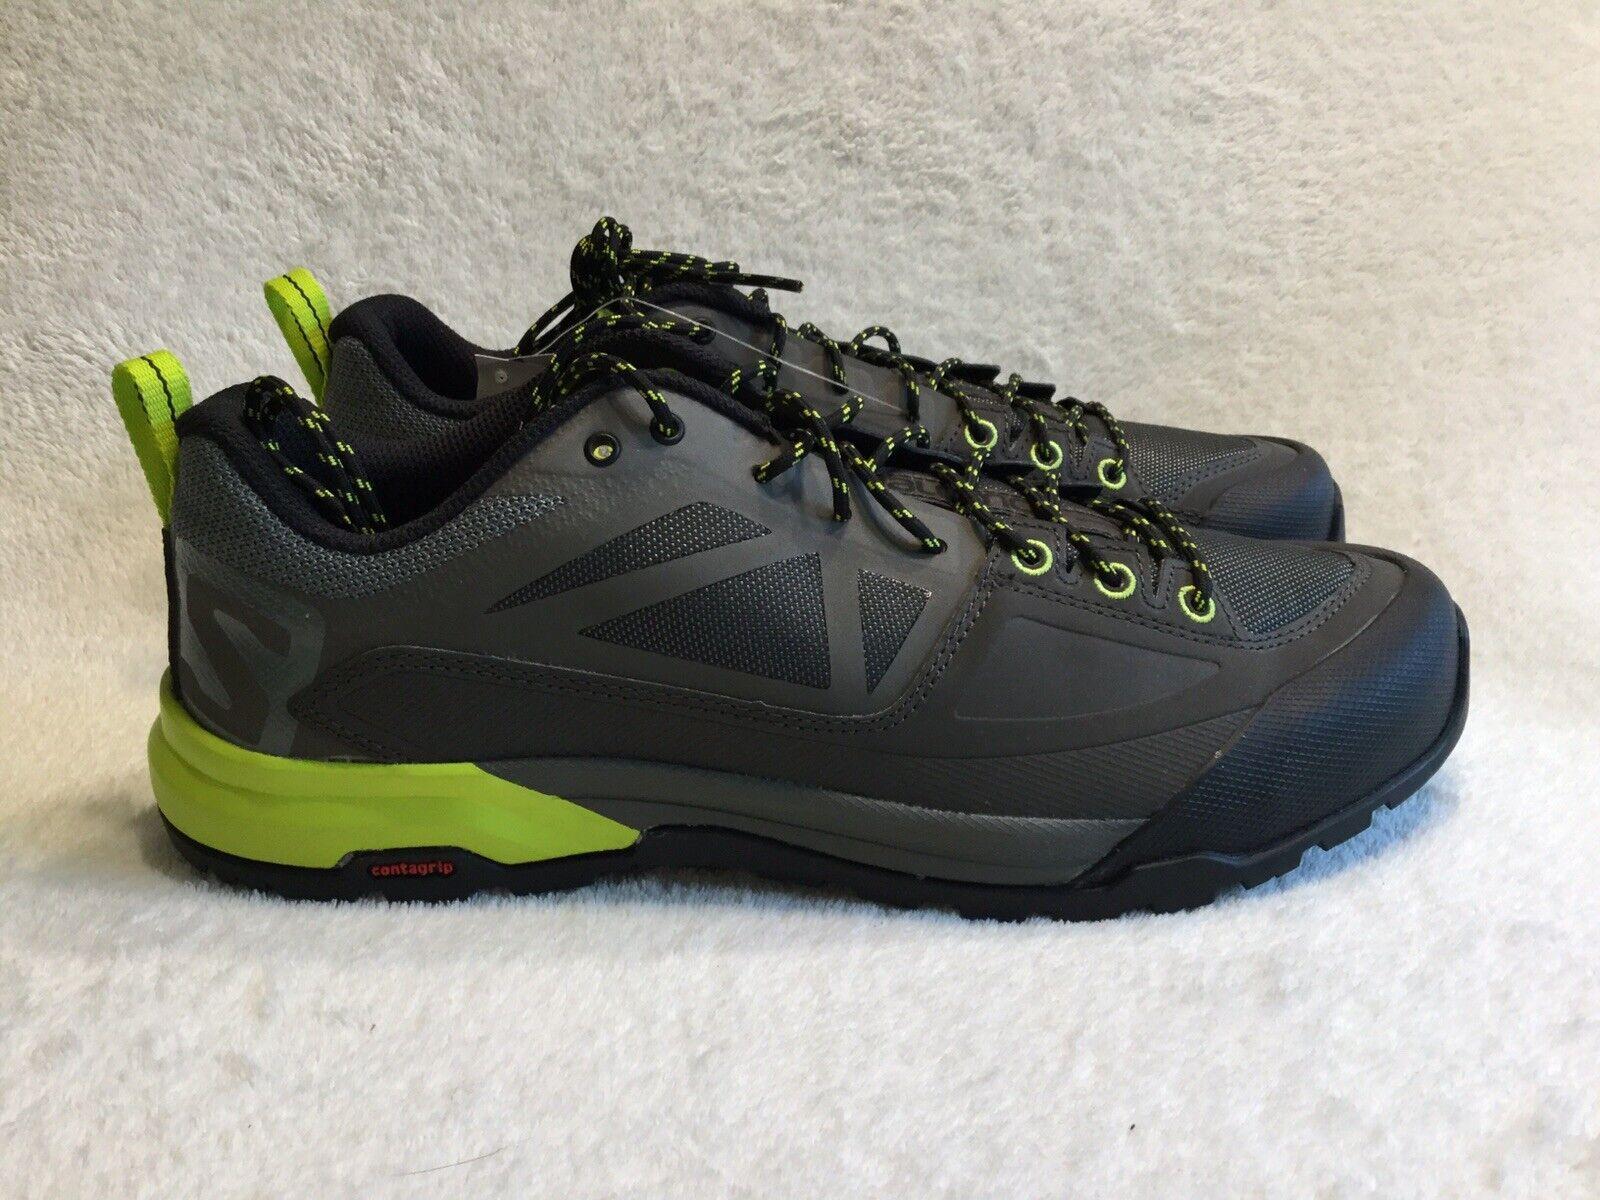 Salomon X Alp Spry Mens Approach Hiking shoes Grey Size 11